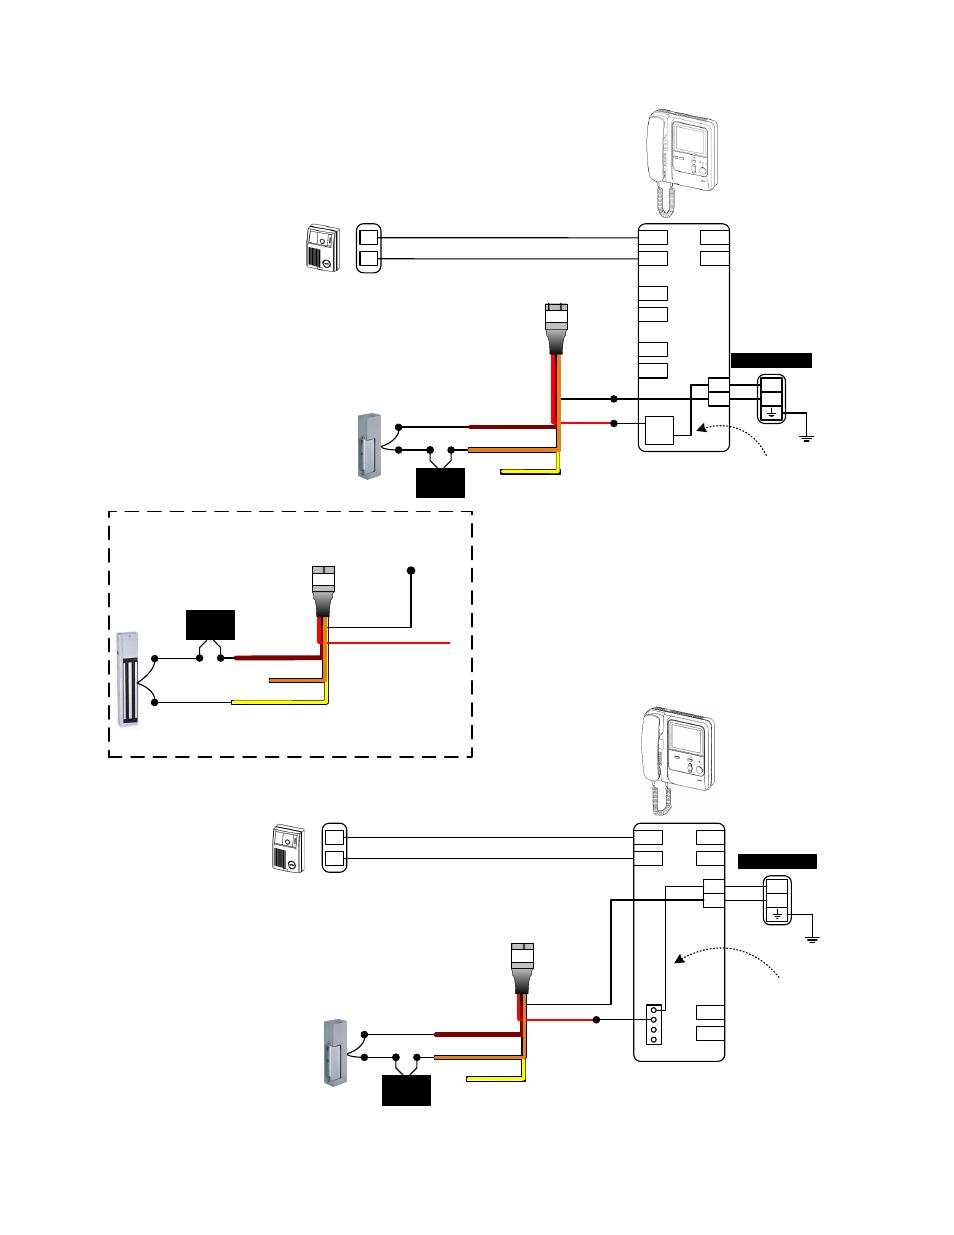 everfocus camera wiring diagram for wiring diagrameverfocus camera wiring diagram for